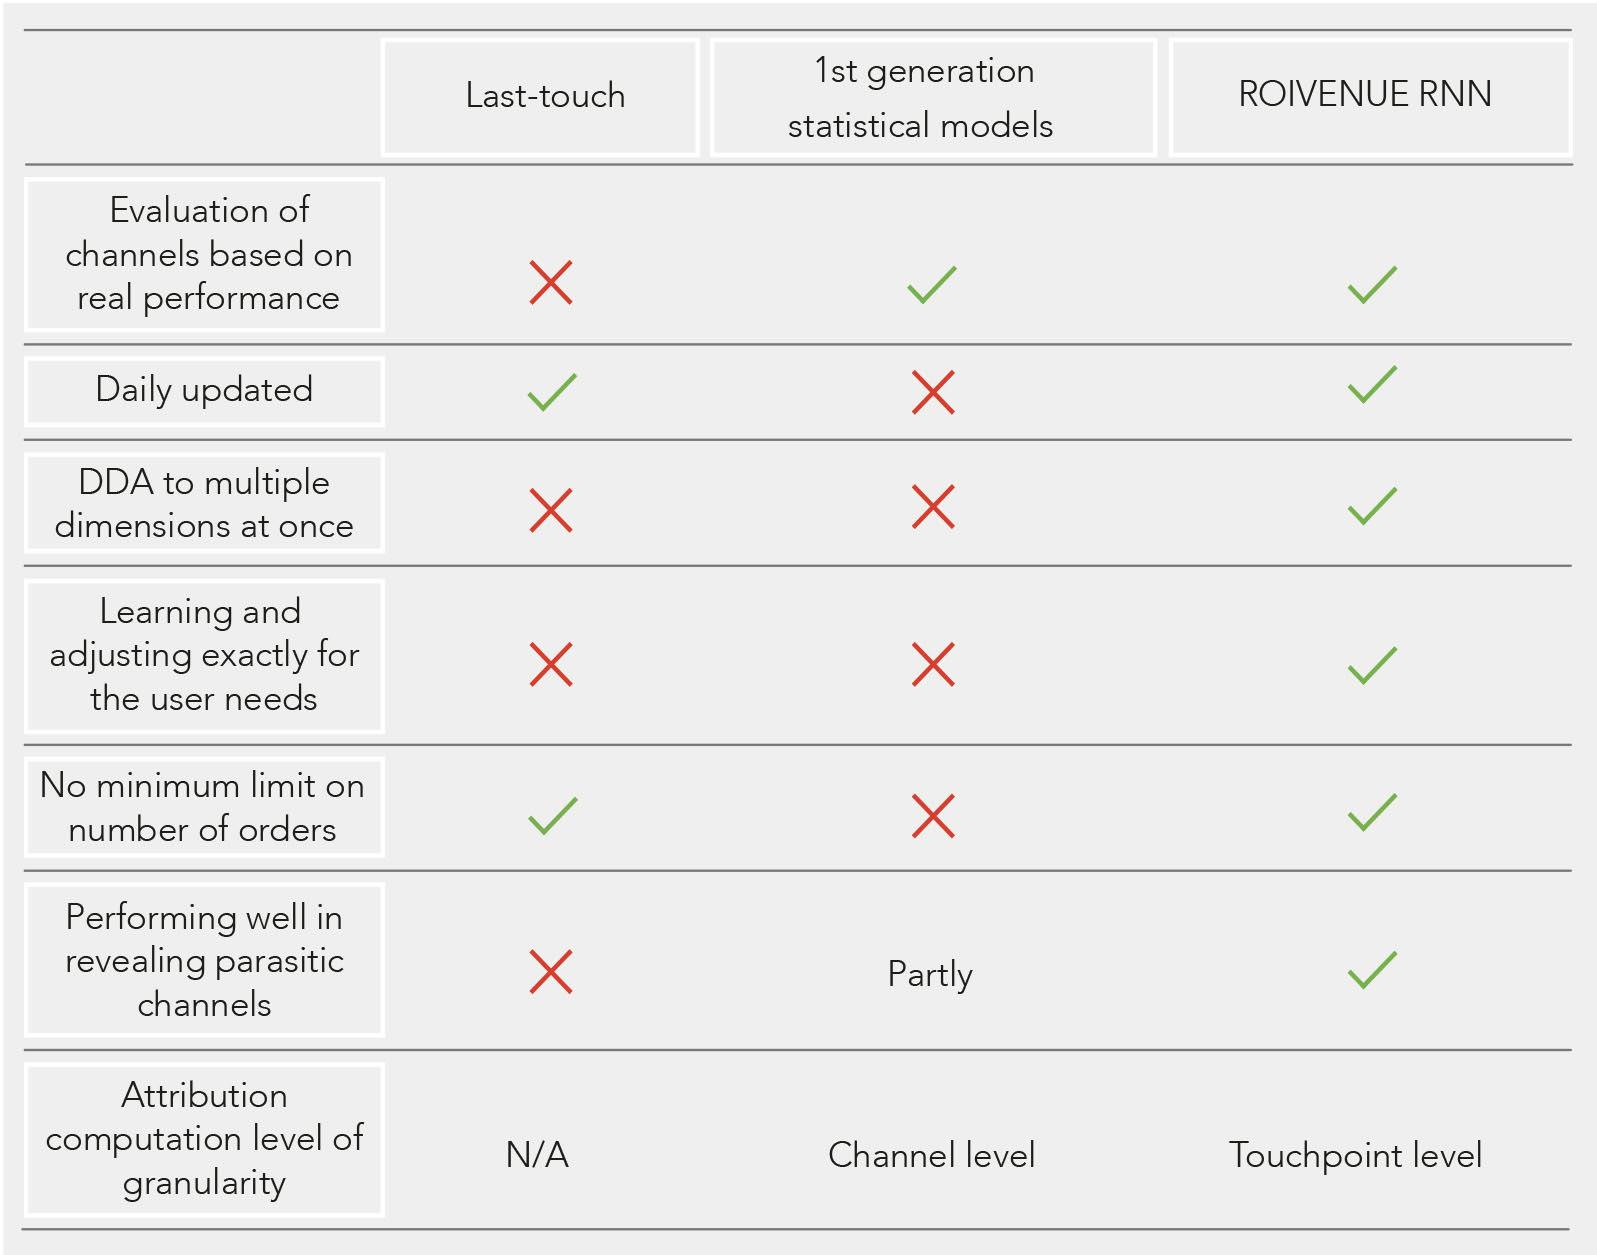 rnn vs statistical models comparison